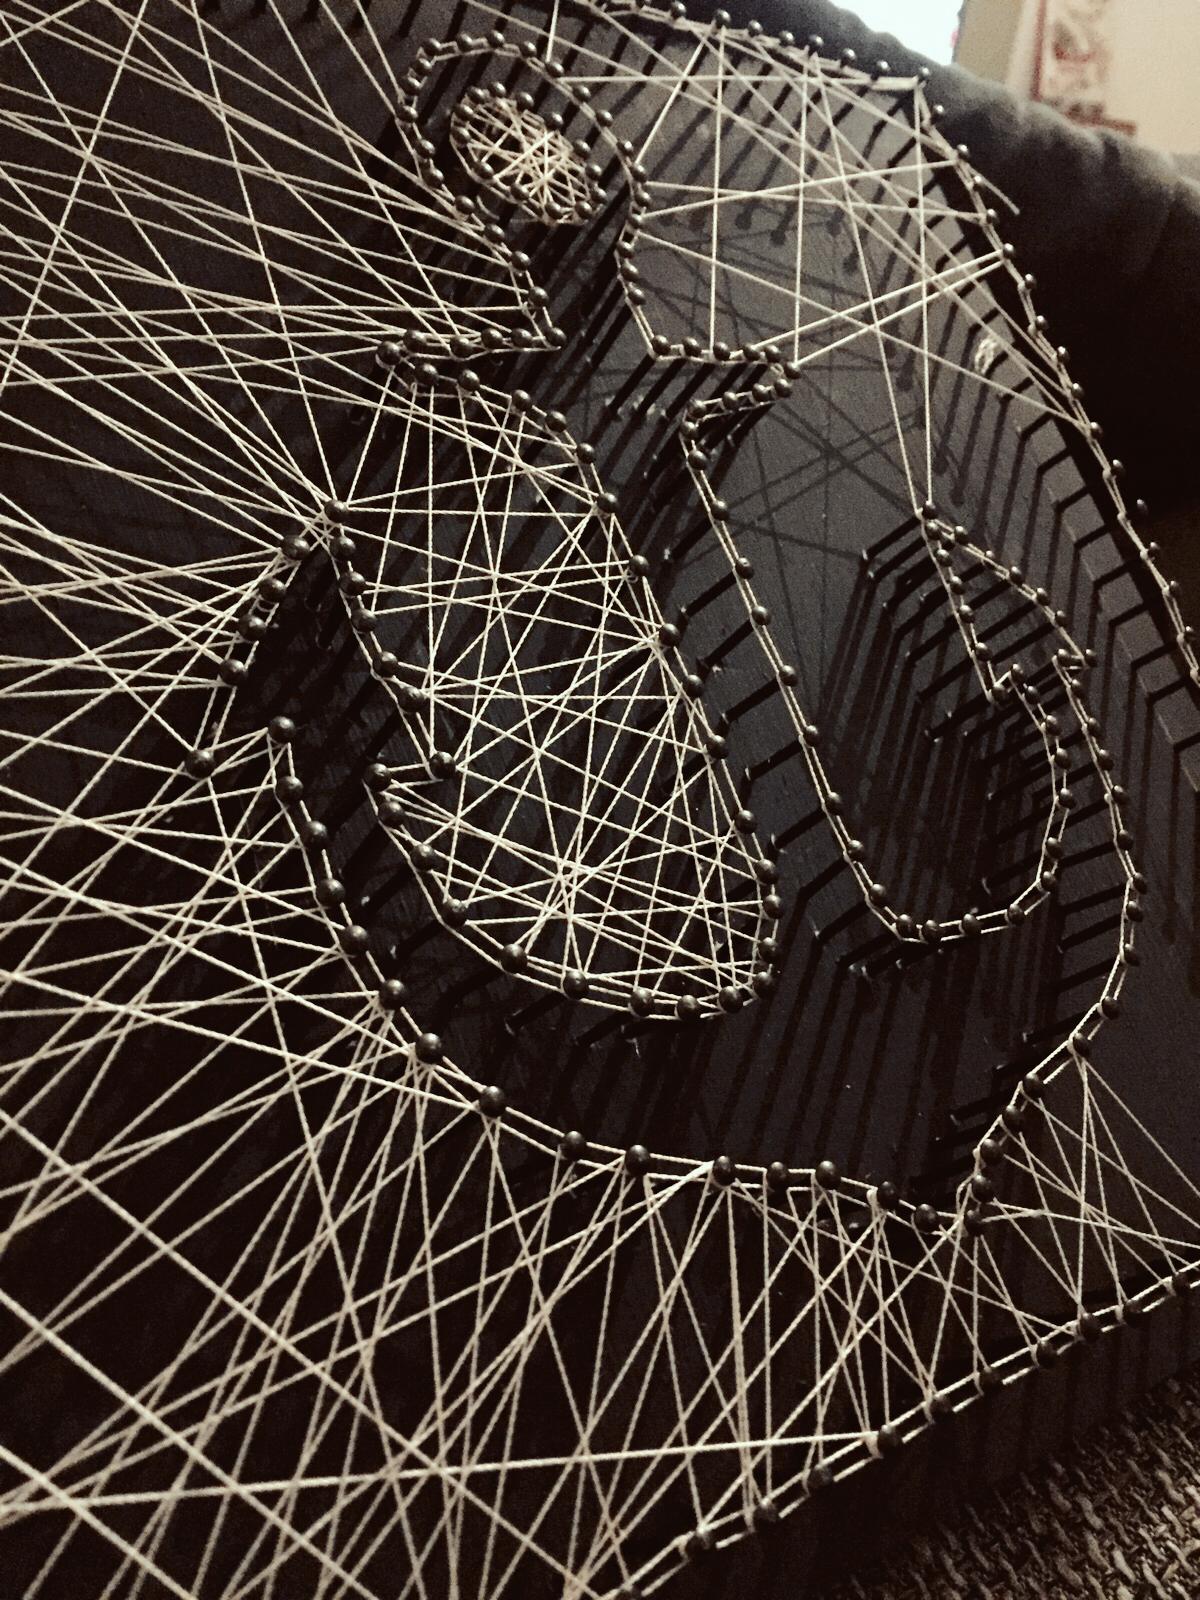 Anker fadenbild crafts beautiful room crafts and string art anker fadenbild diy wedding presentsdo it yourselfdiy giftsstring artcrafts solutioingenieria Choice Image